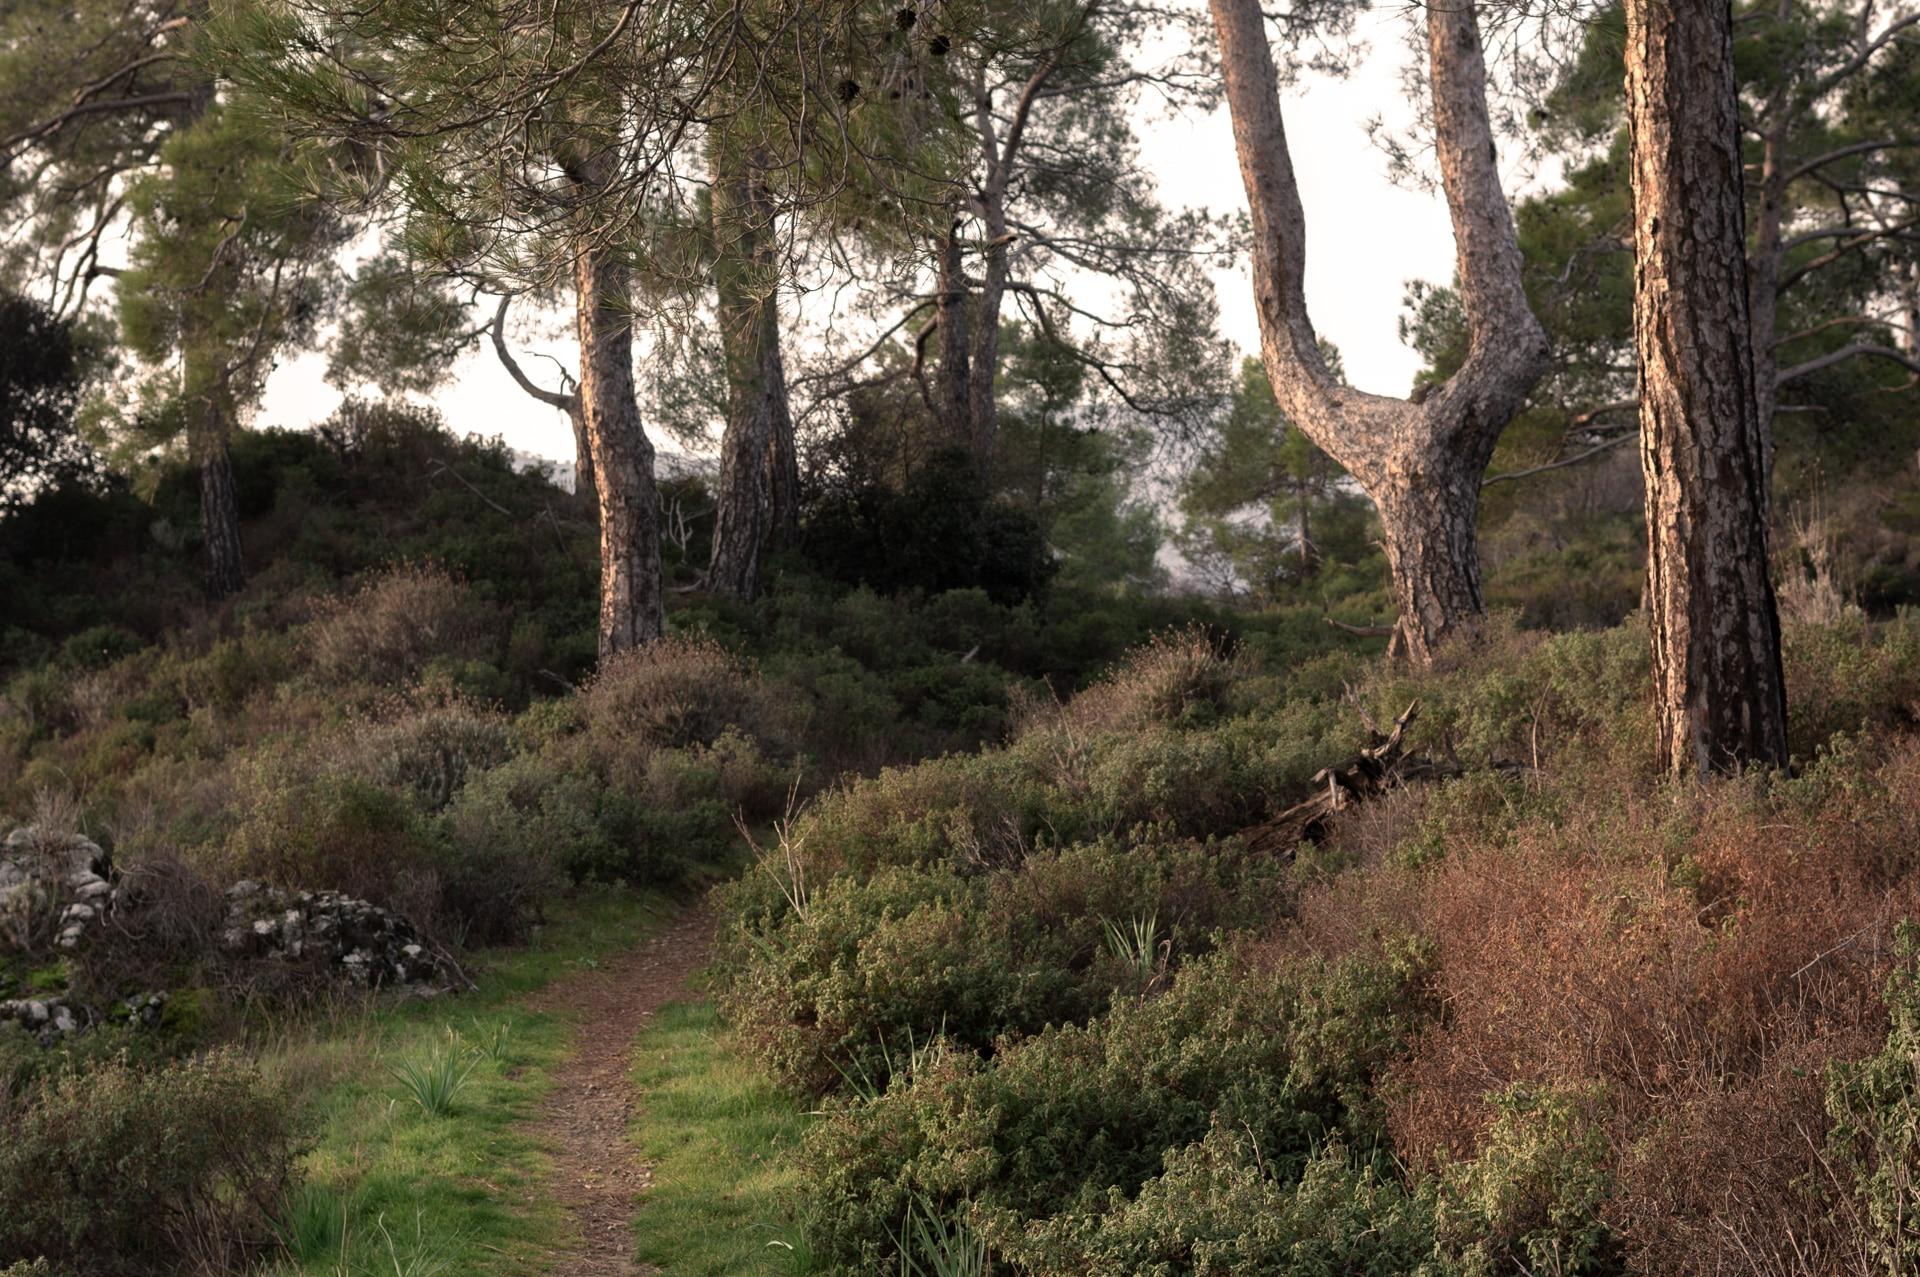 The trail of Kionia - Profitis ilias inside the woods